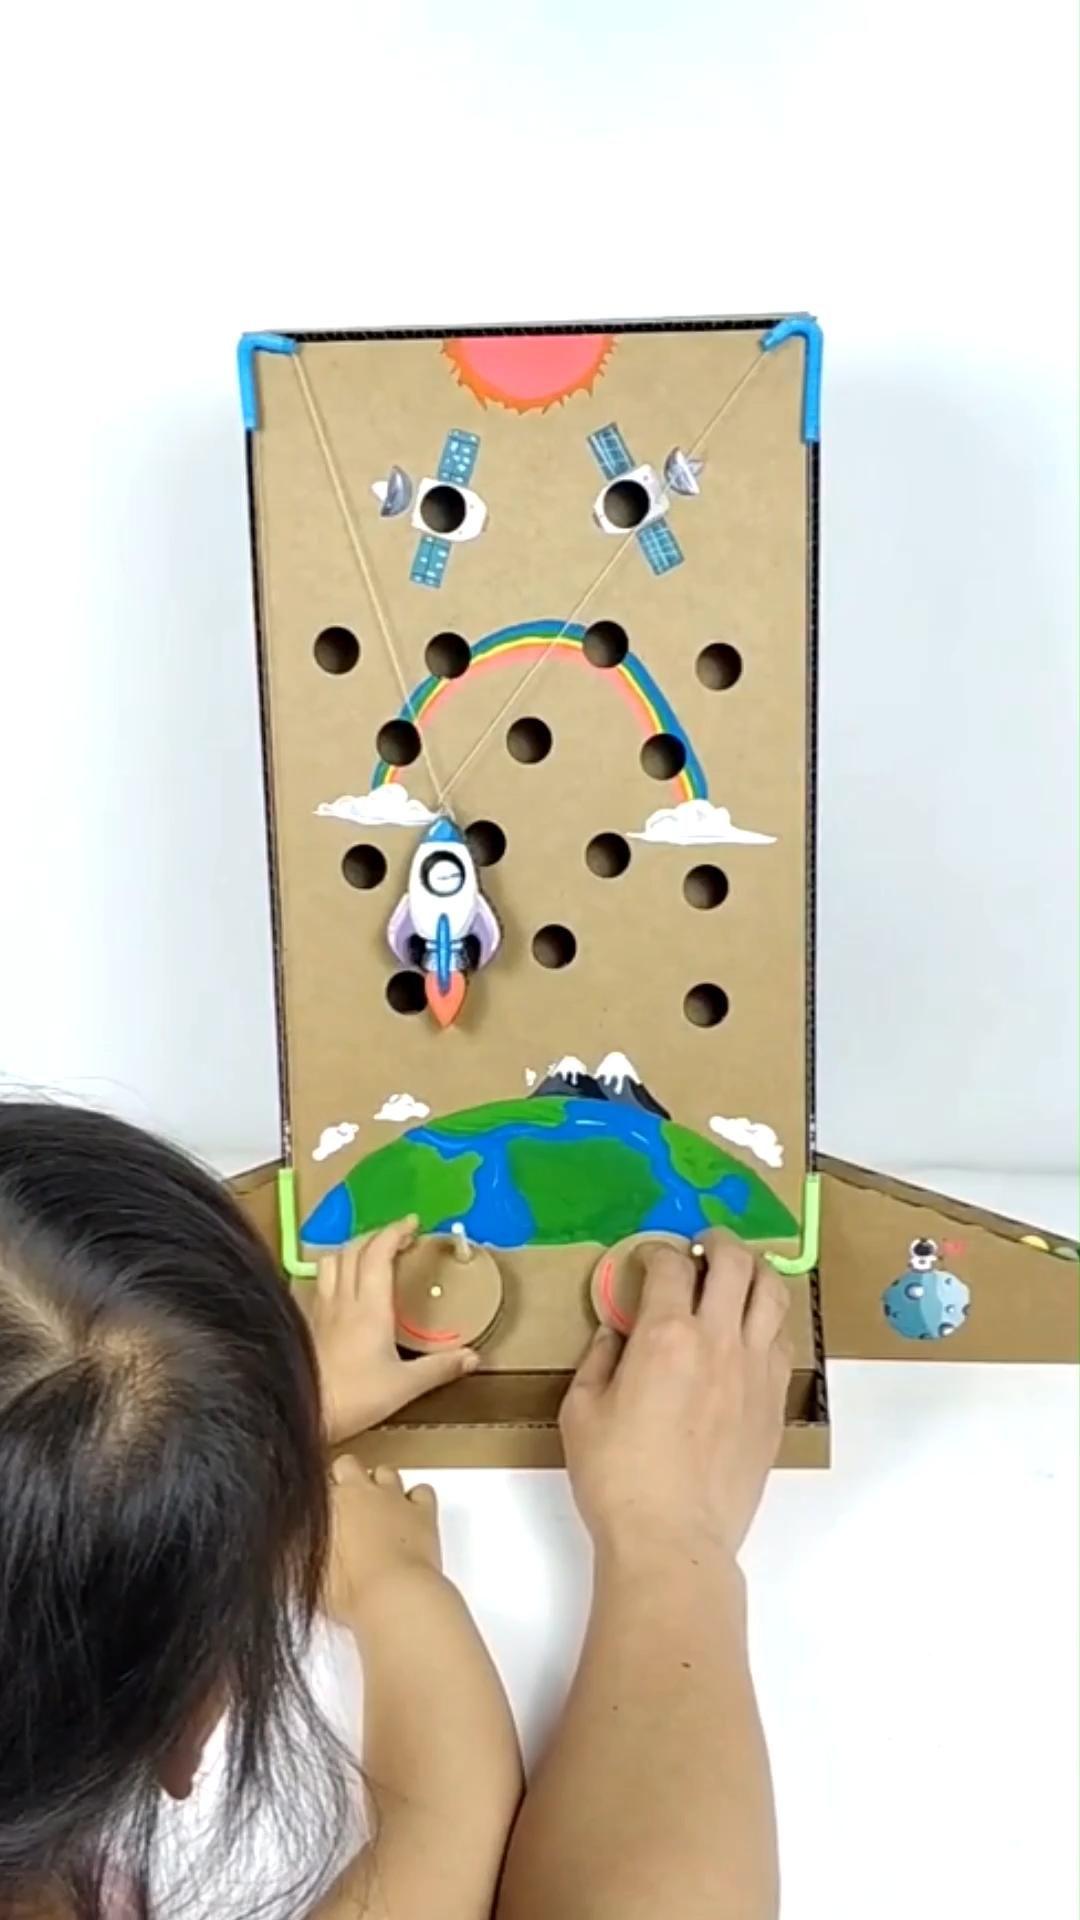 Space travel DIY cardboard toy